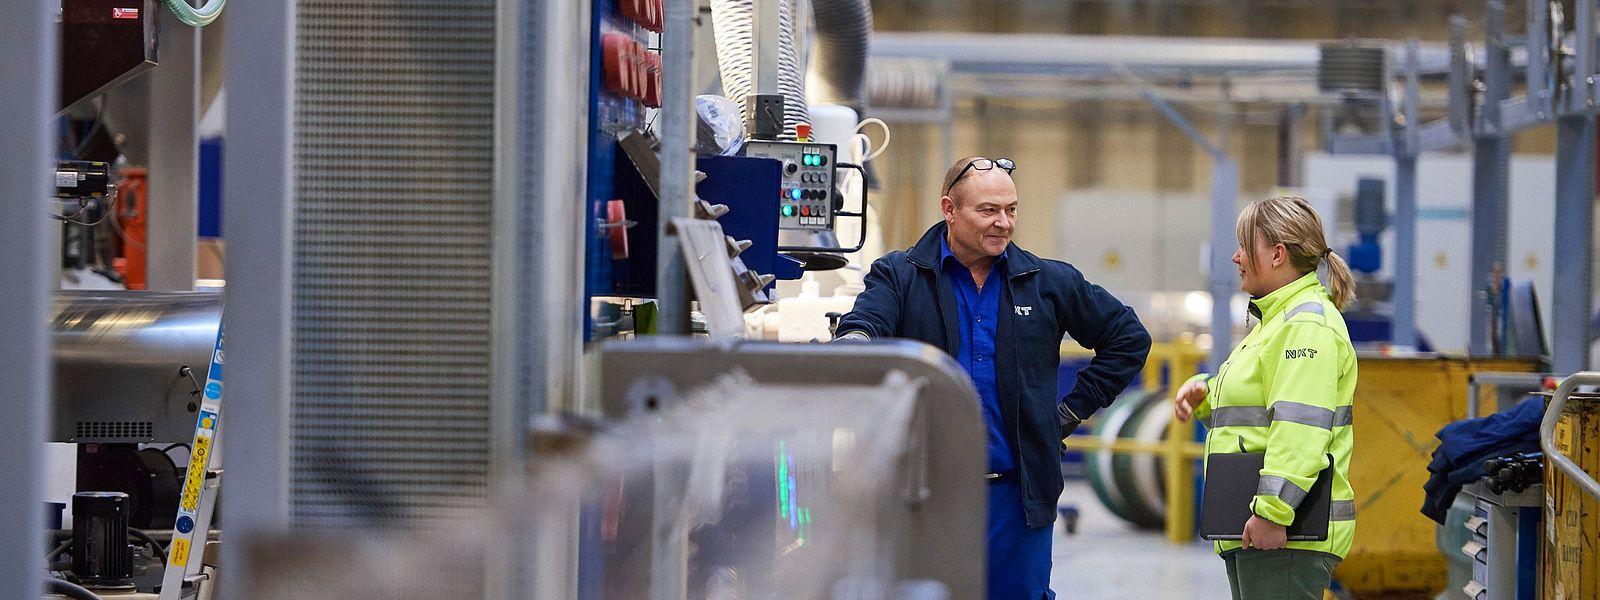 Factory worker talking to office employee